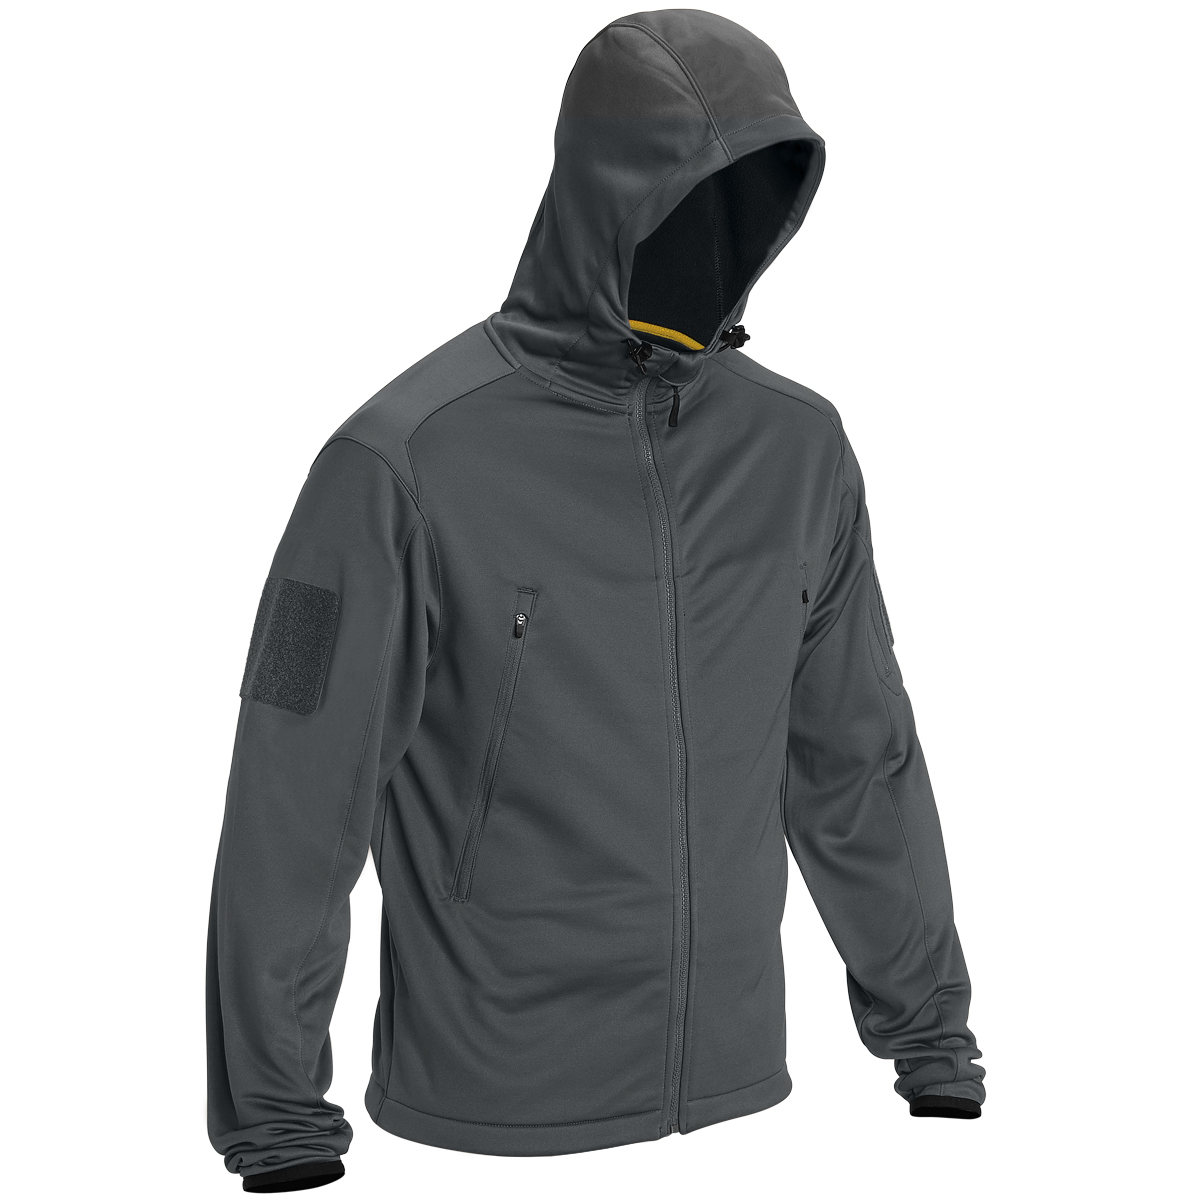 Military hoodies